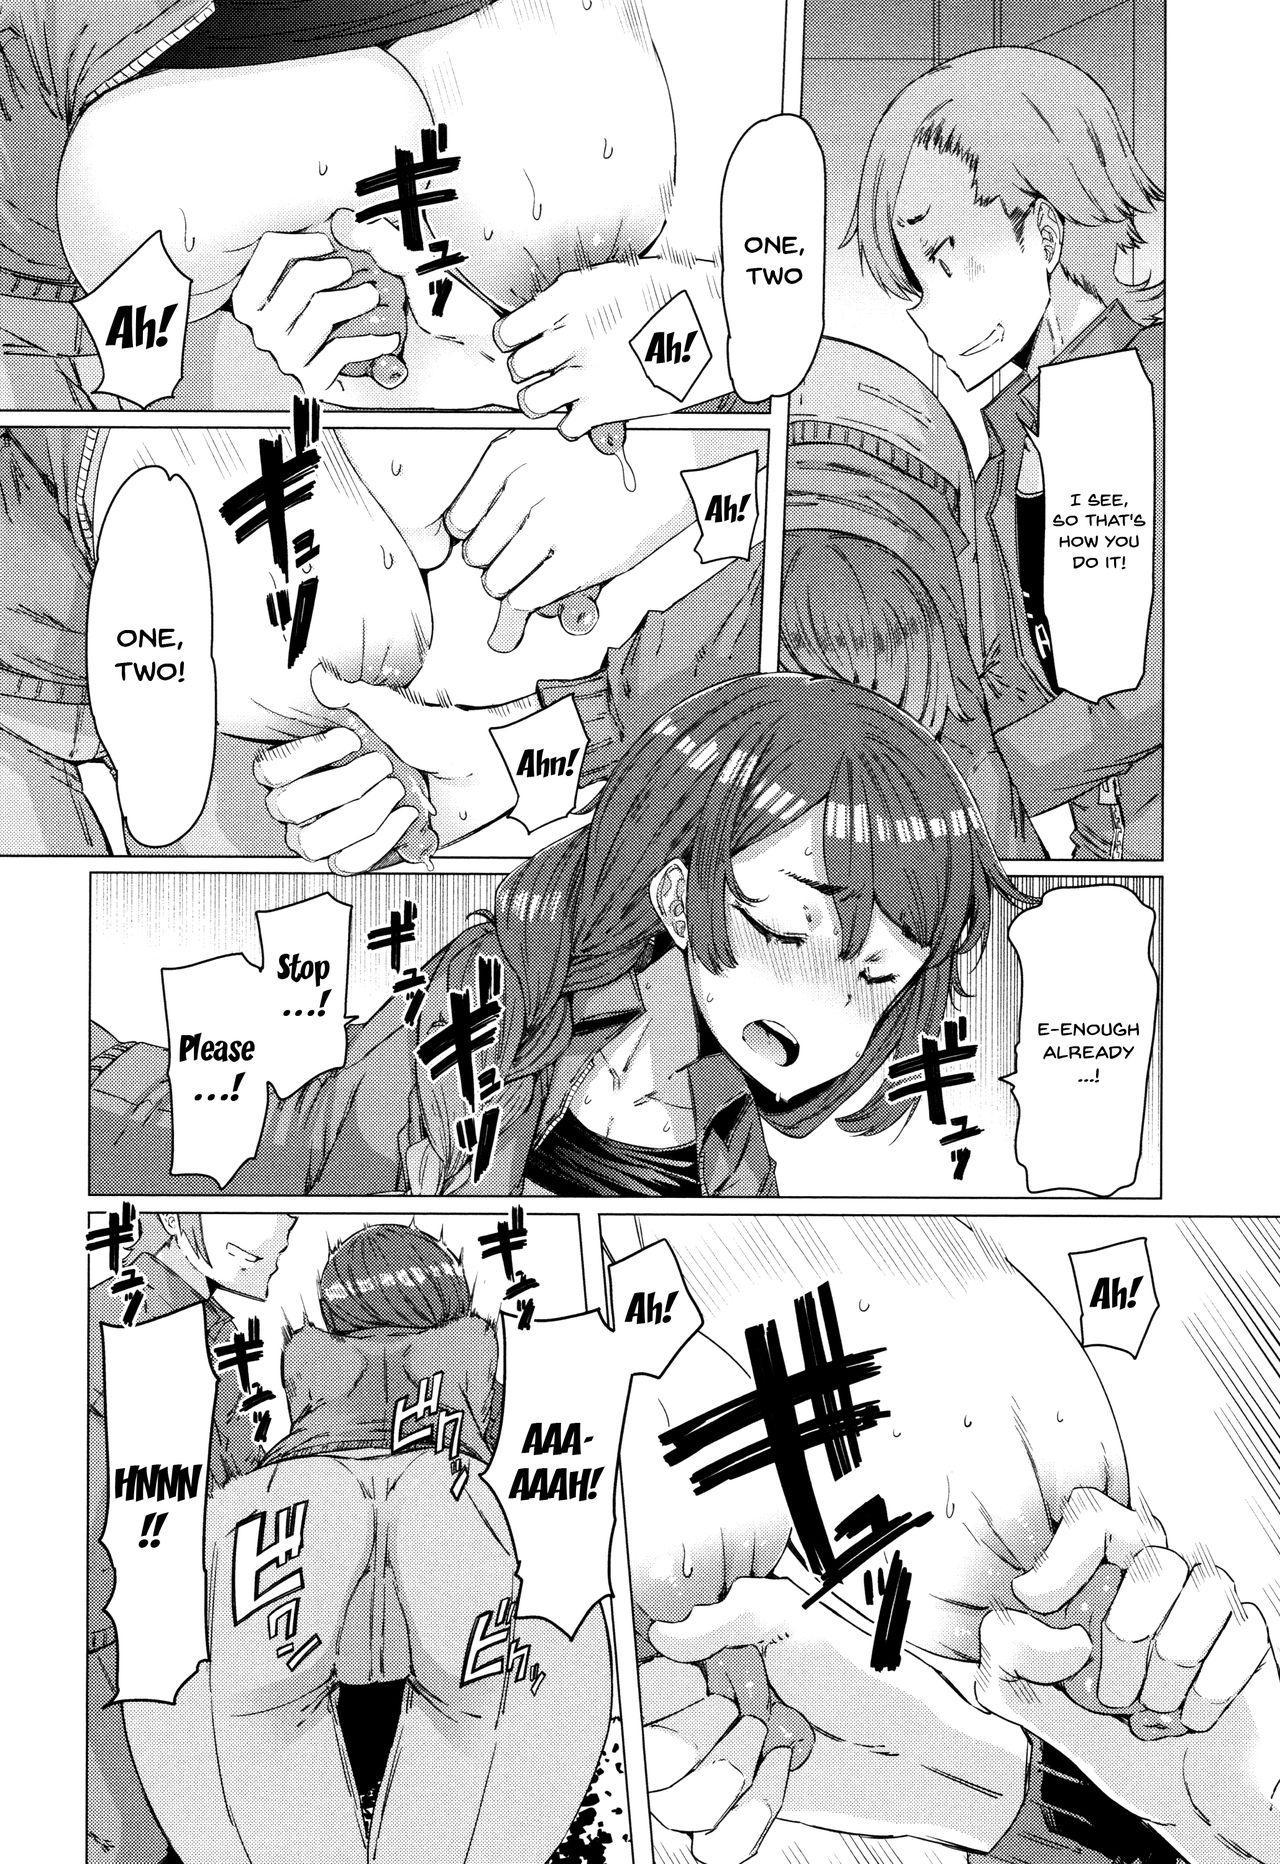 Hitozuma ga Ero Sugite Shigoto ni Naranai! | These Housewives Are Too Lewd I Can't Help It! Ch.1-7 83